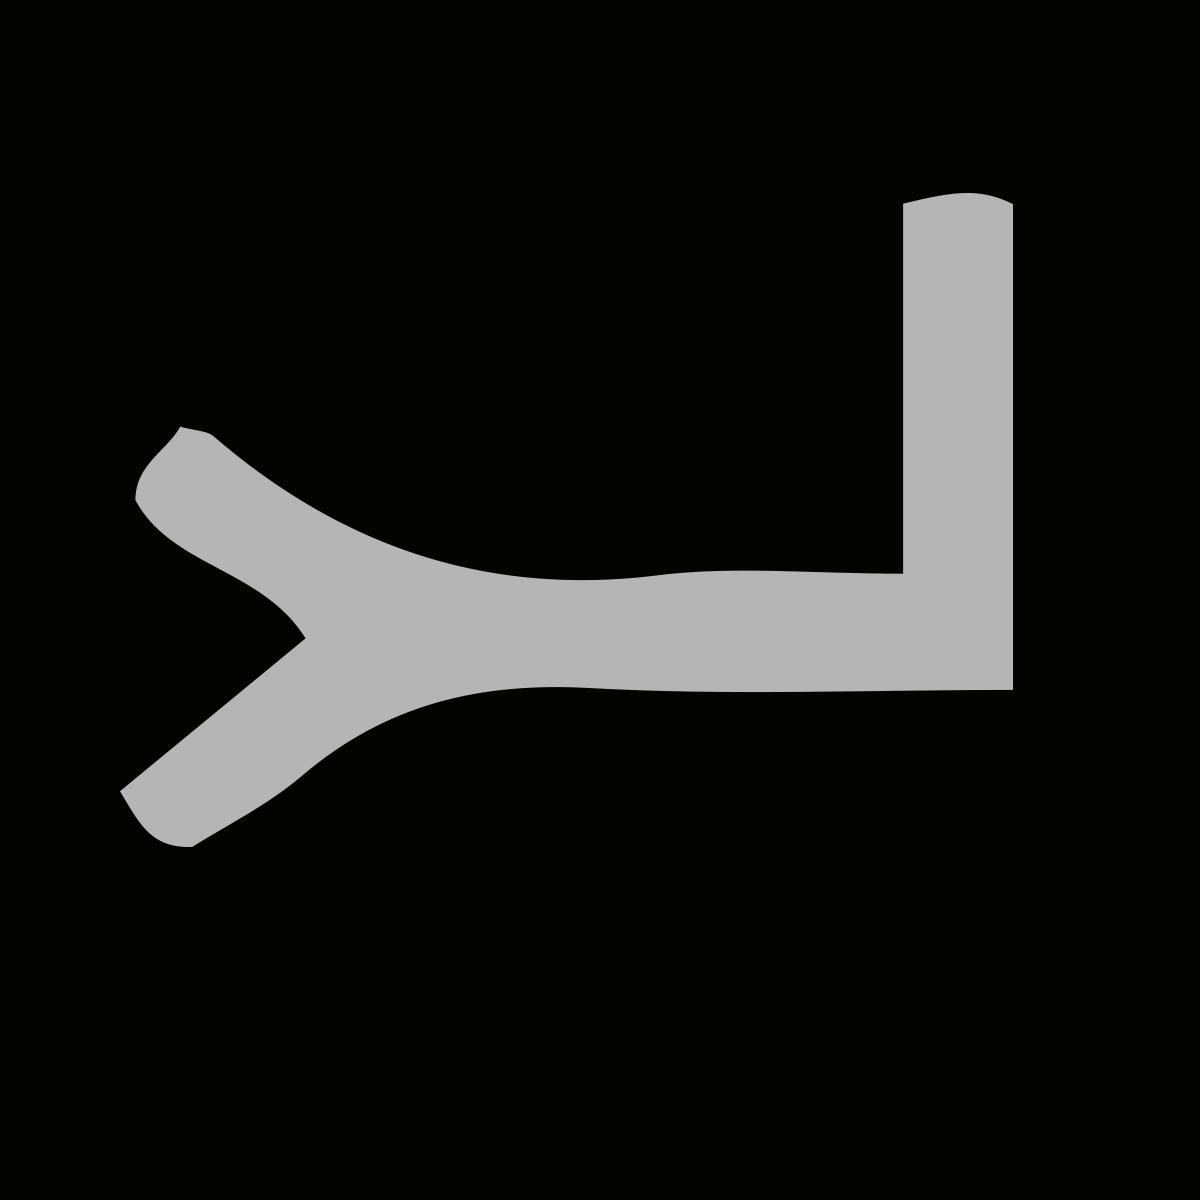 Yod: arm & hand, work, deed